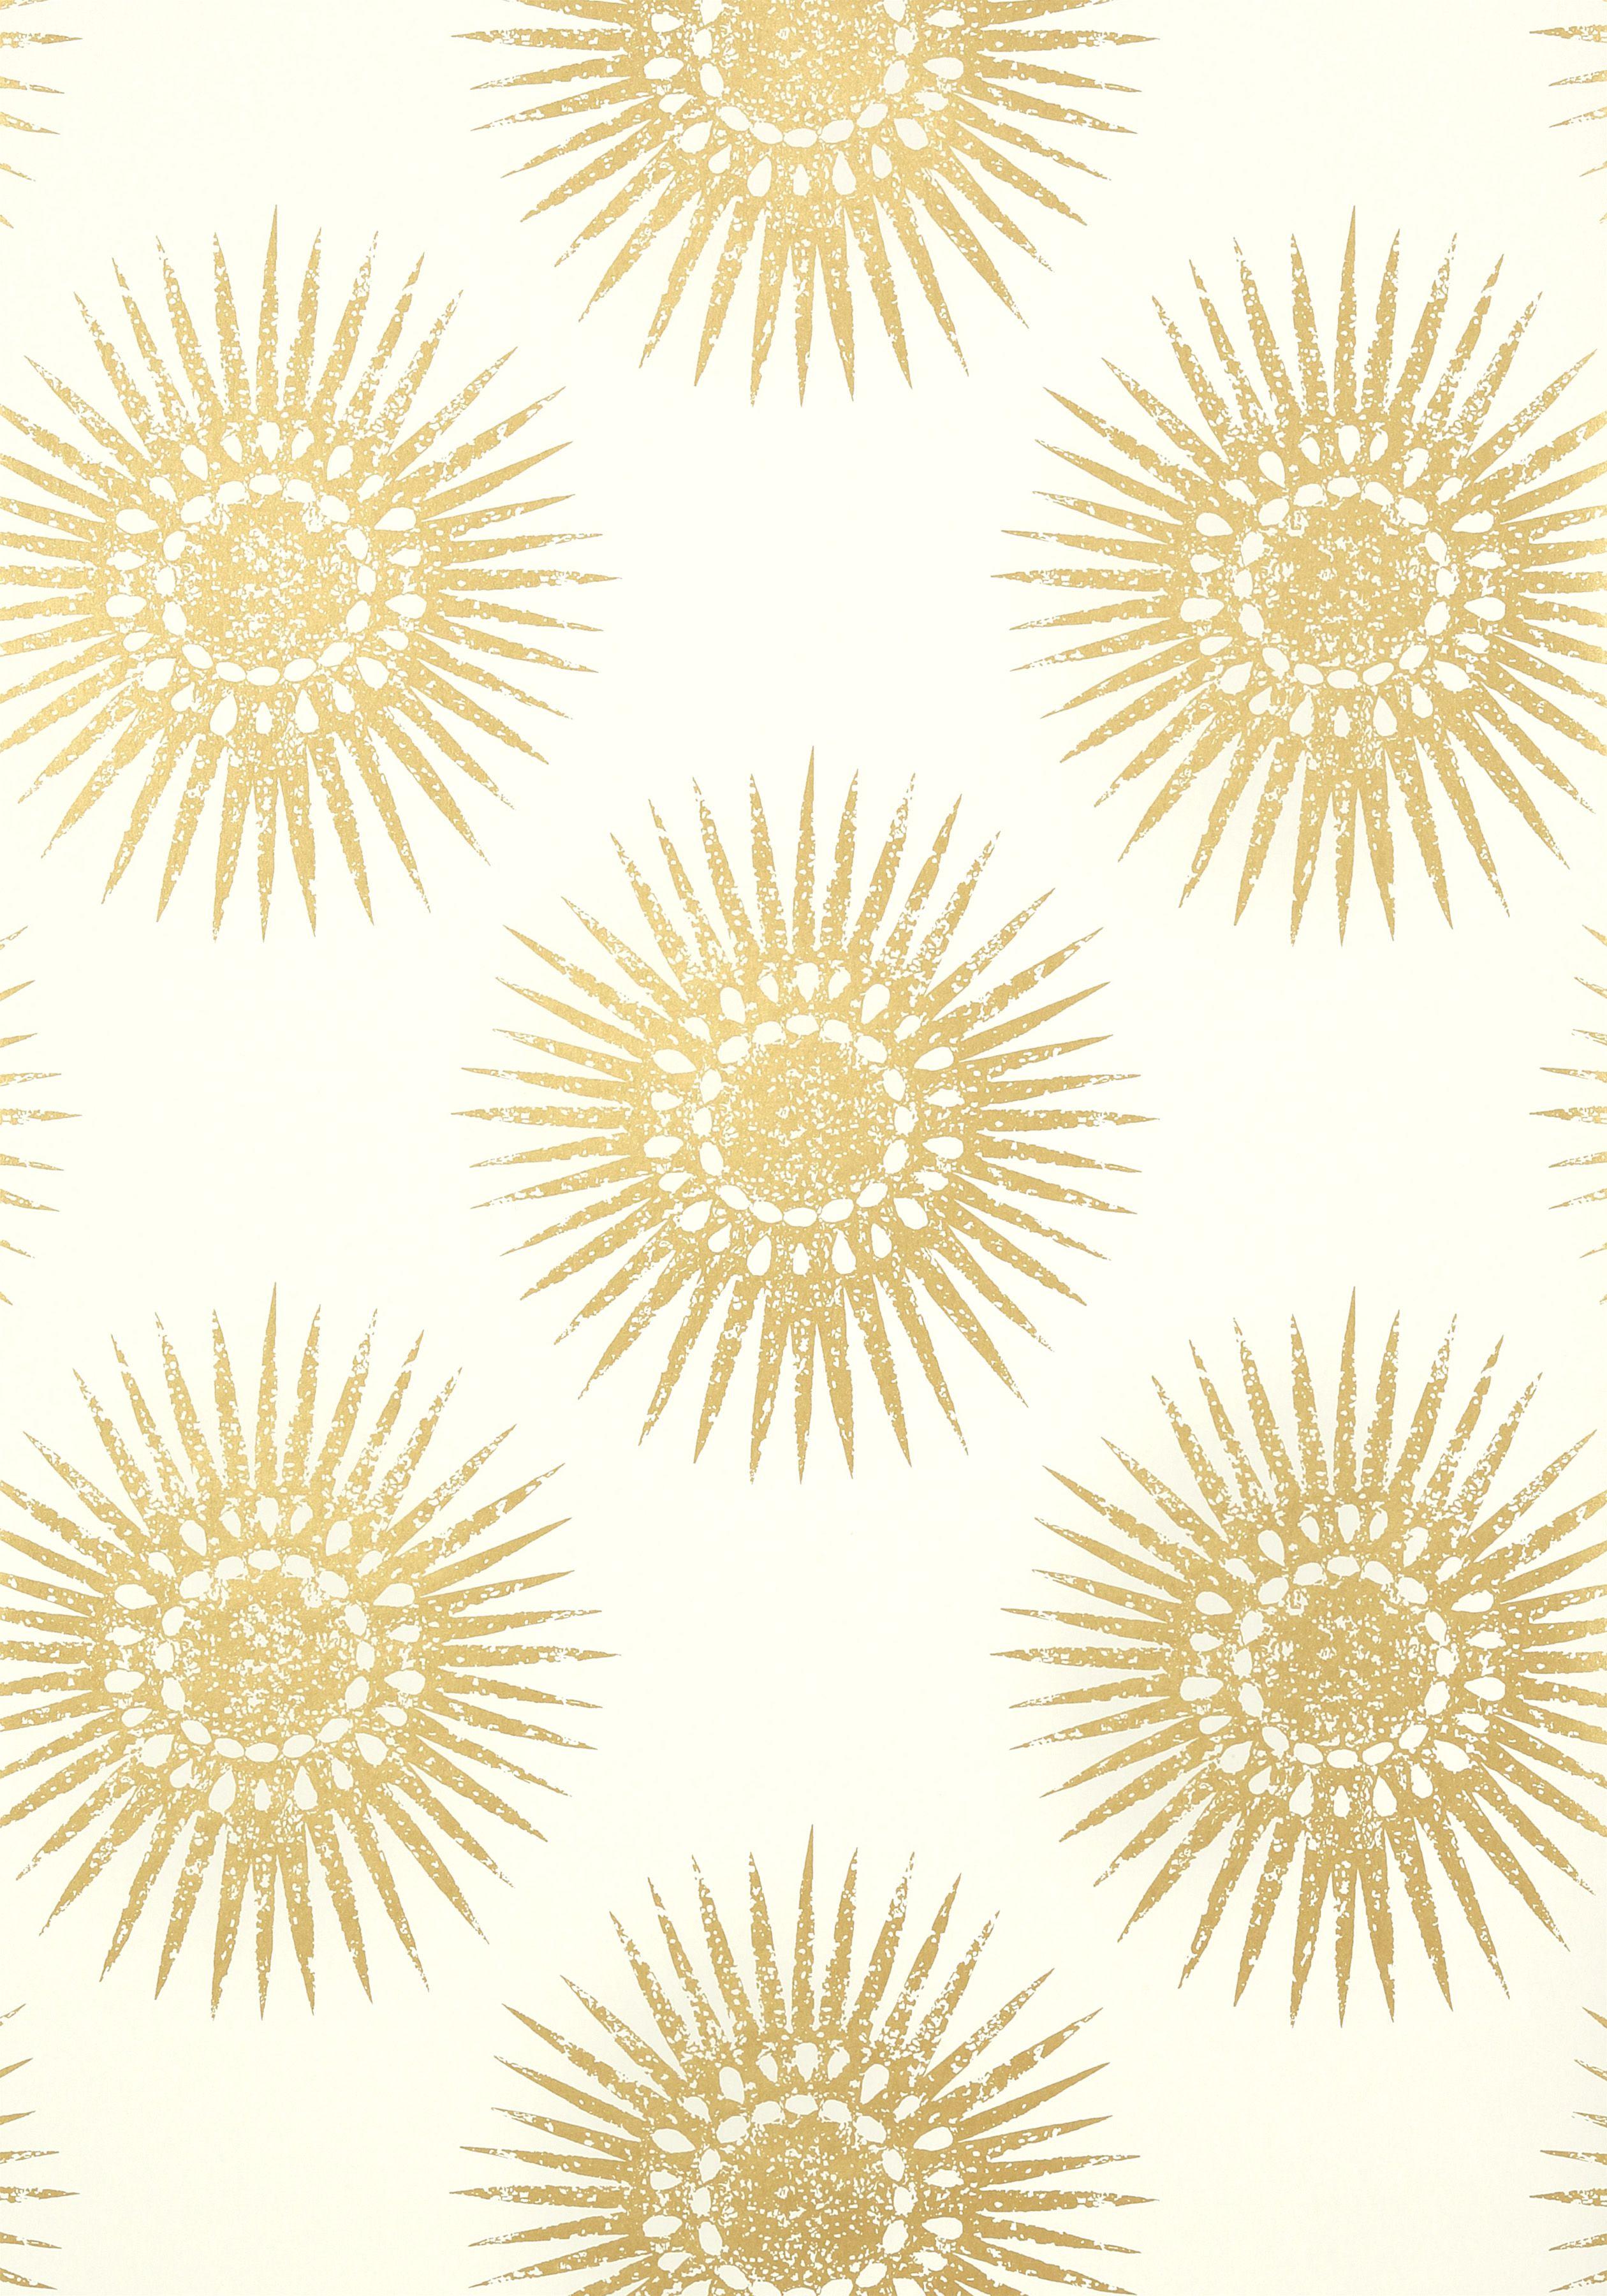 BAHIA, Metallic Gold on Cream, T35143, Collection Graphic